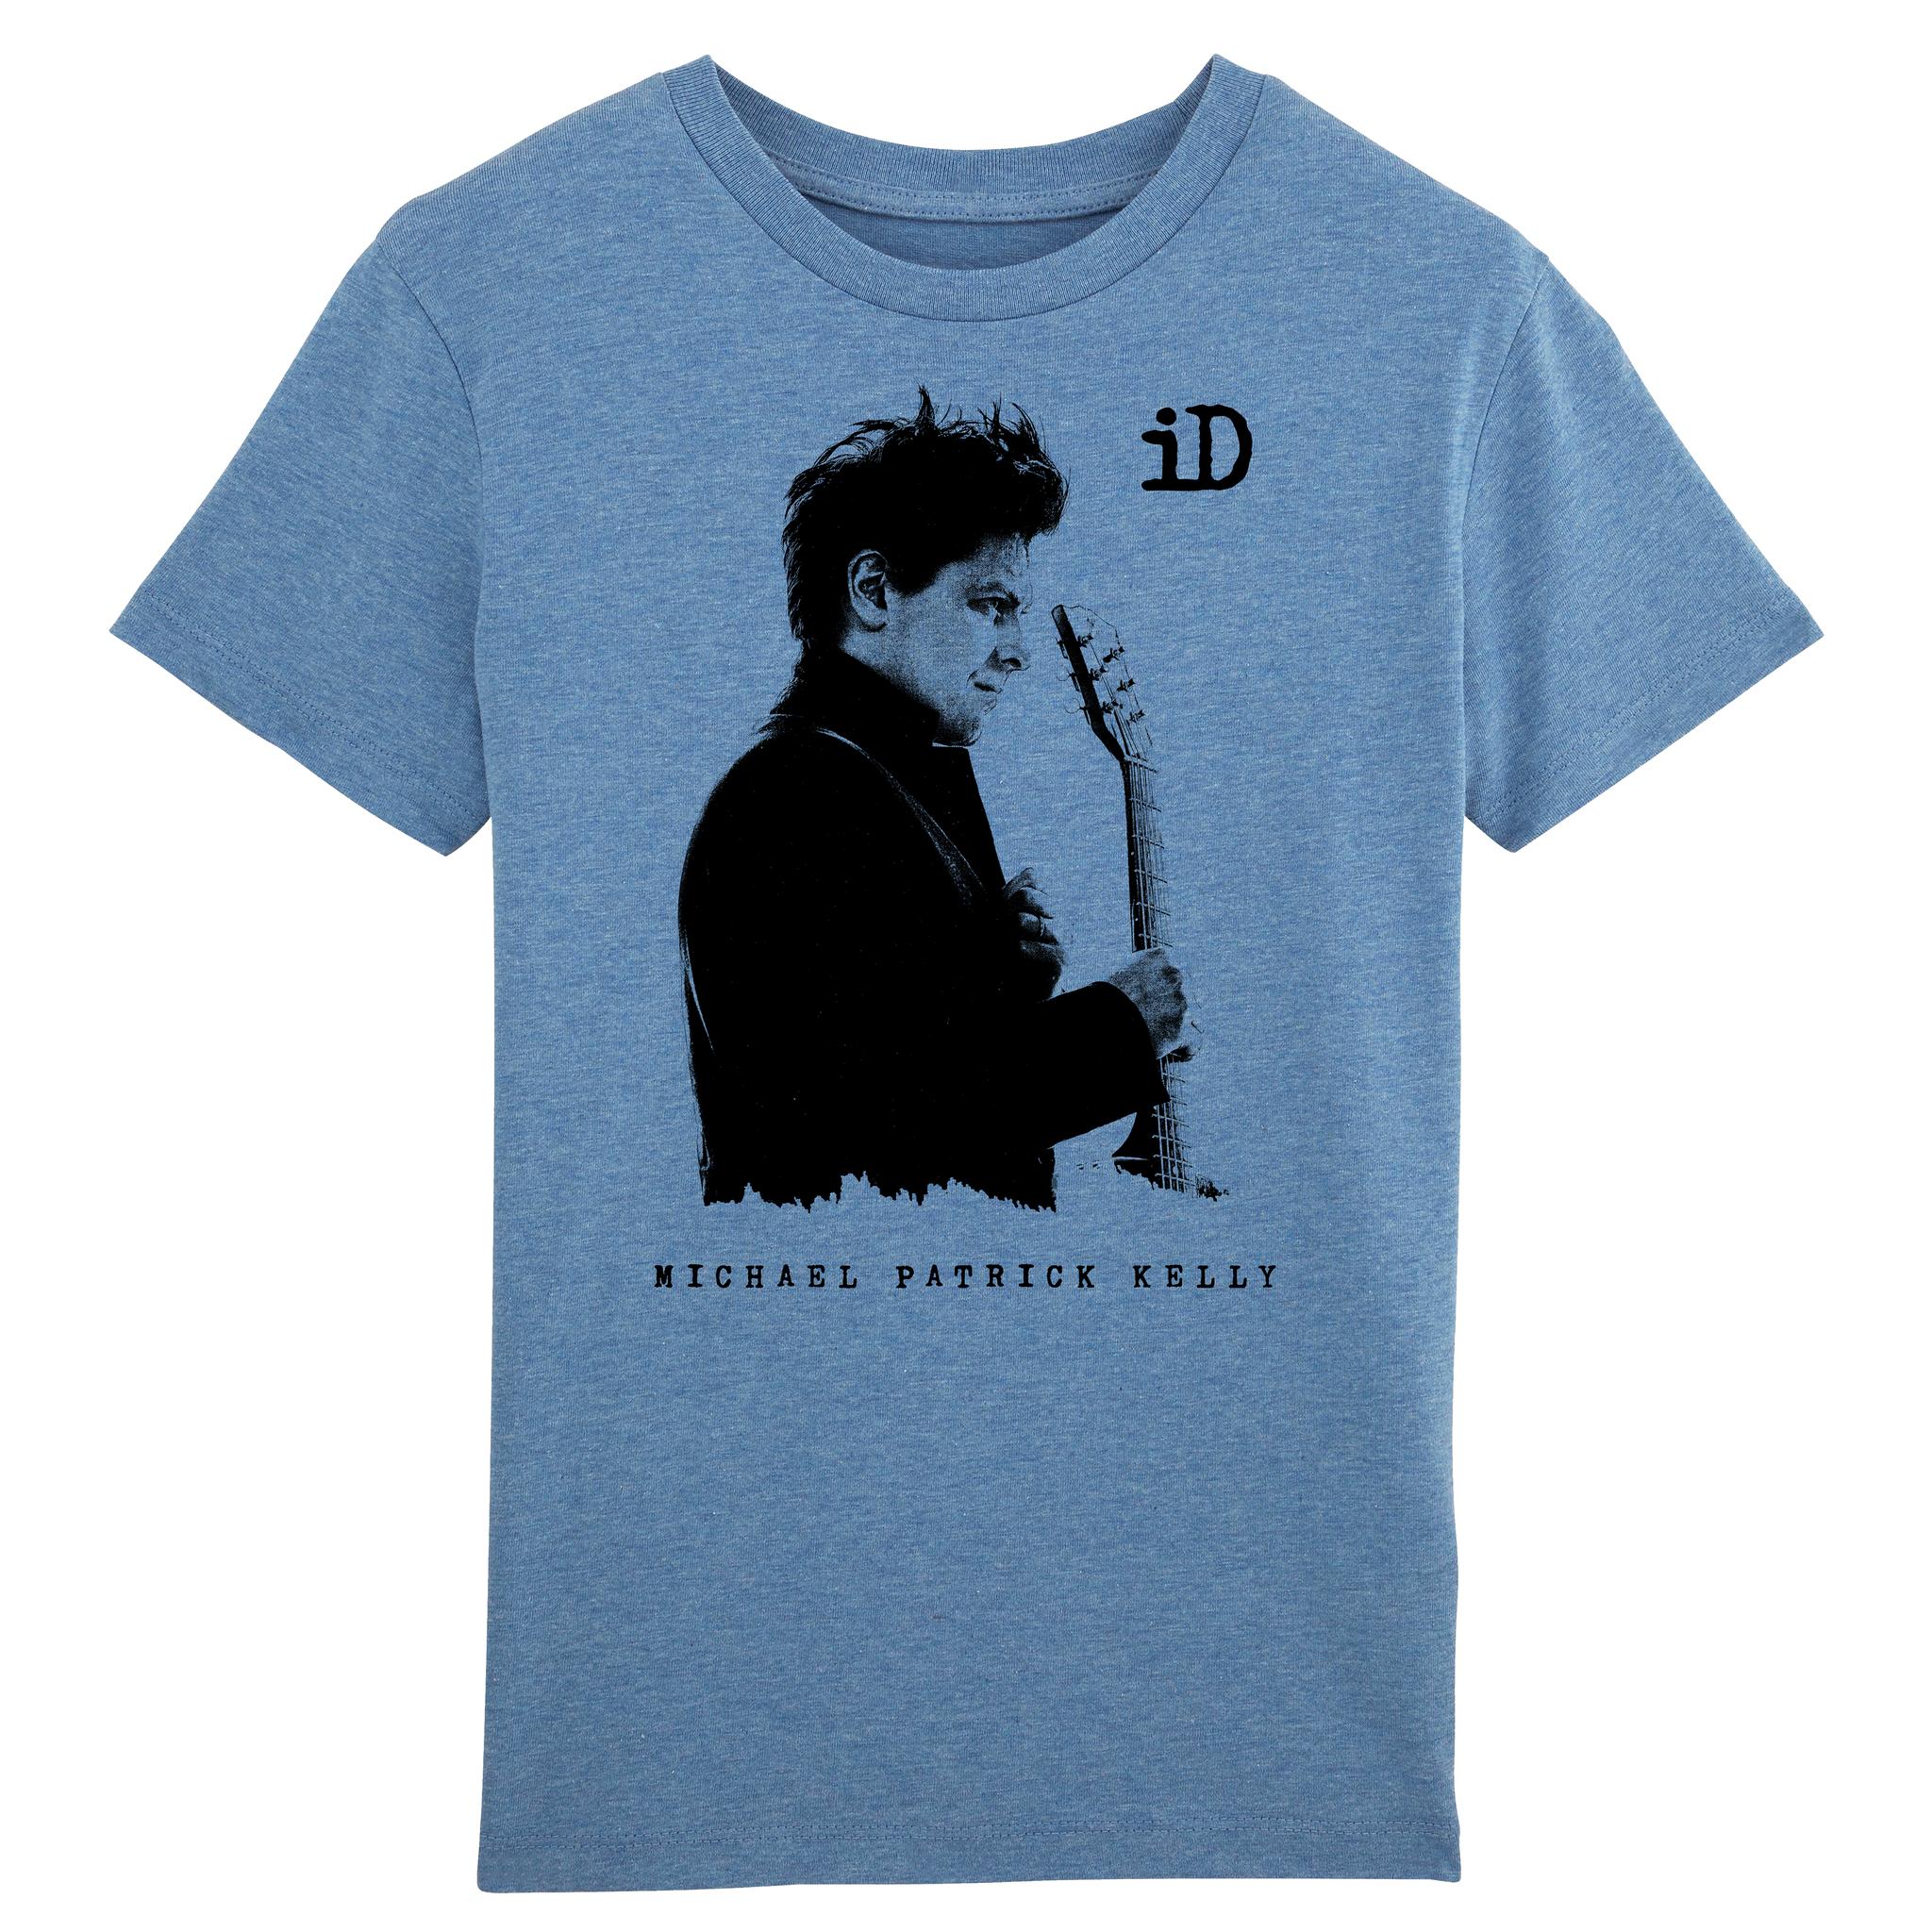 "Stanley Mini Creator Kinder T-Shirt Kinder Shirt ""iD"" blau aus Biobaumwolle"